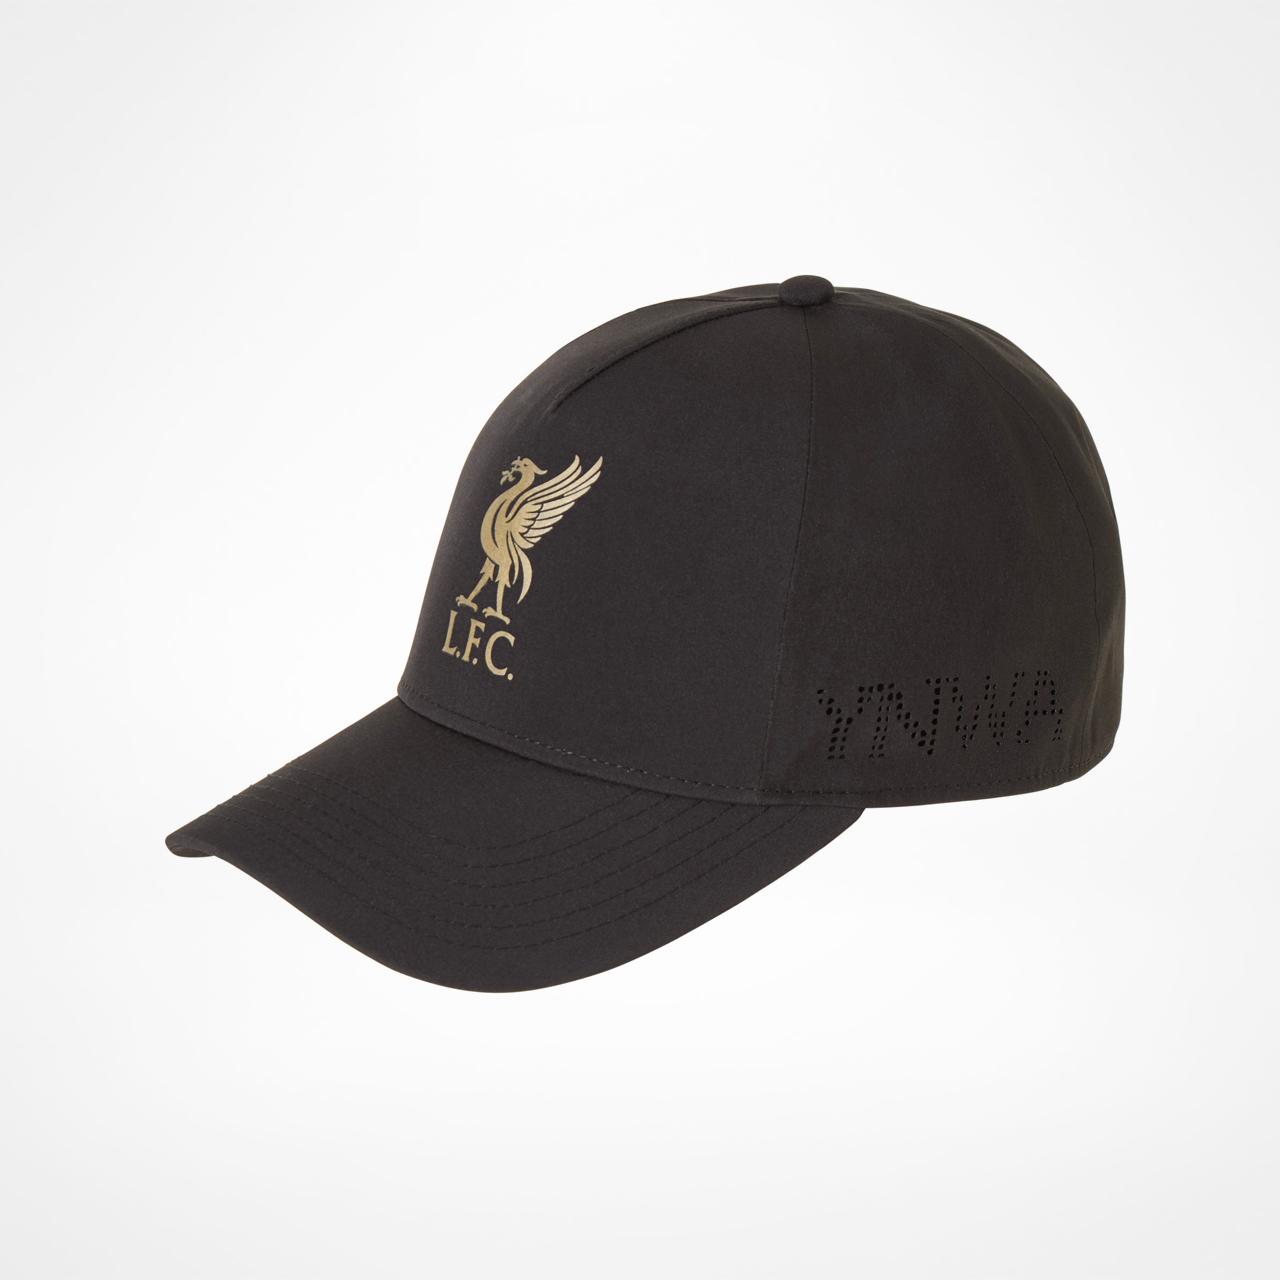 200307246be New Balance Liverpool Cap – Verein Bild Idee